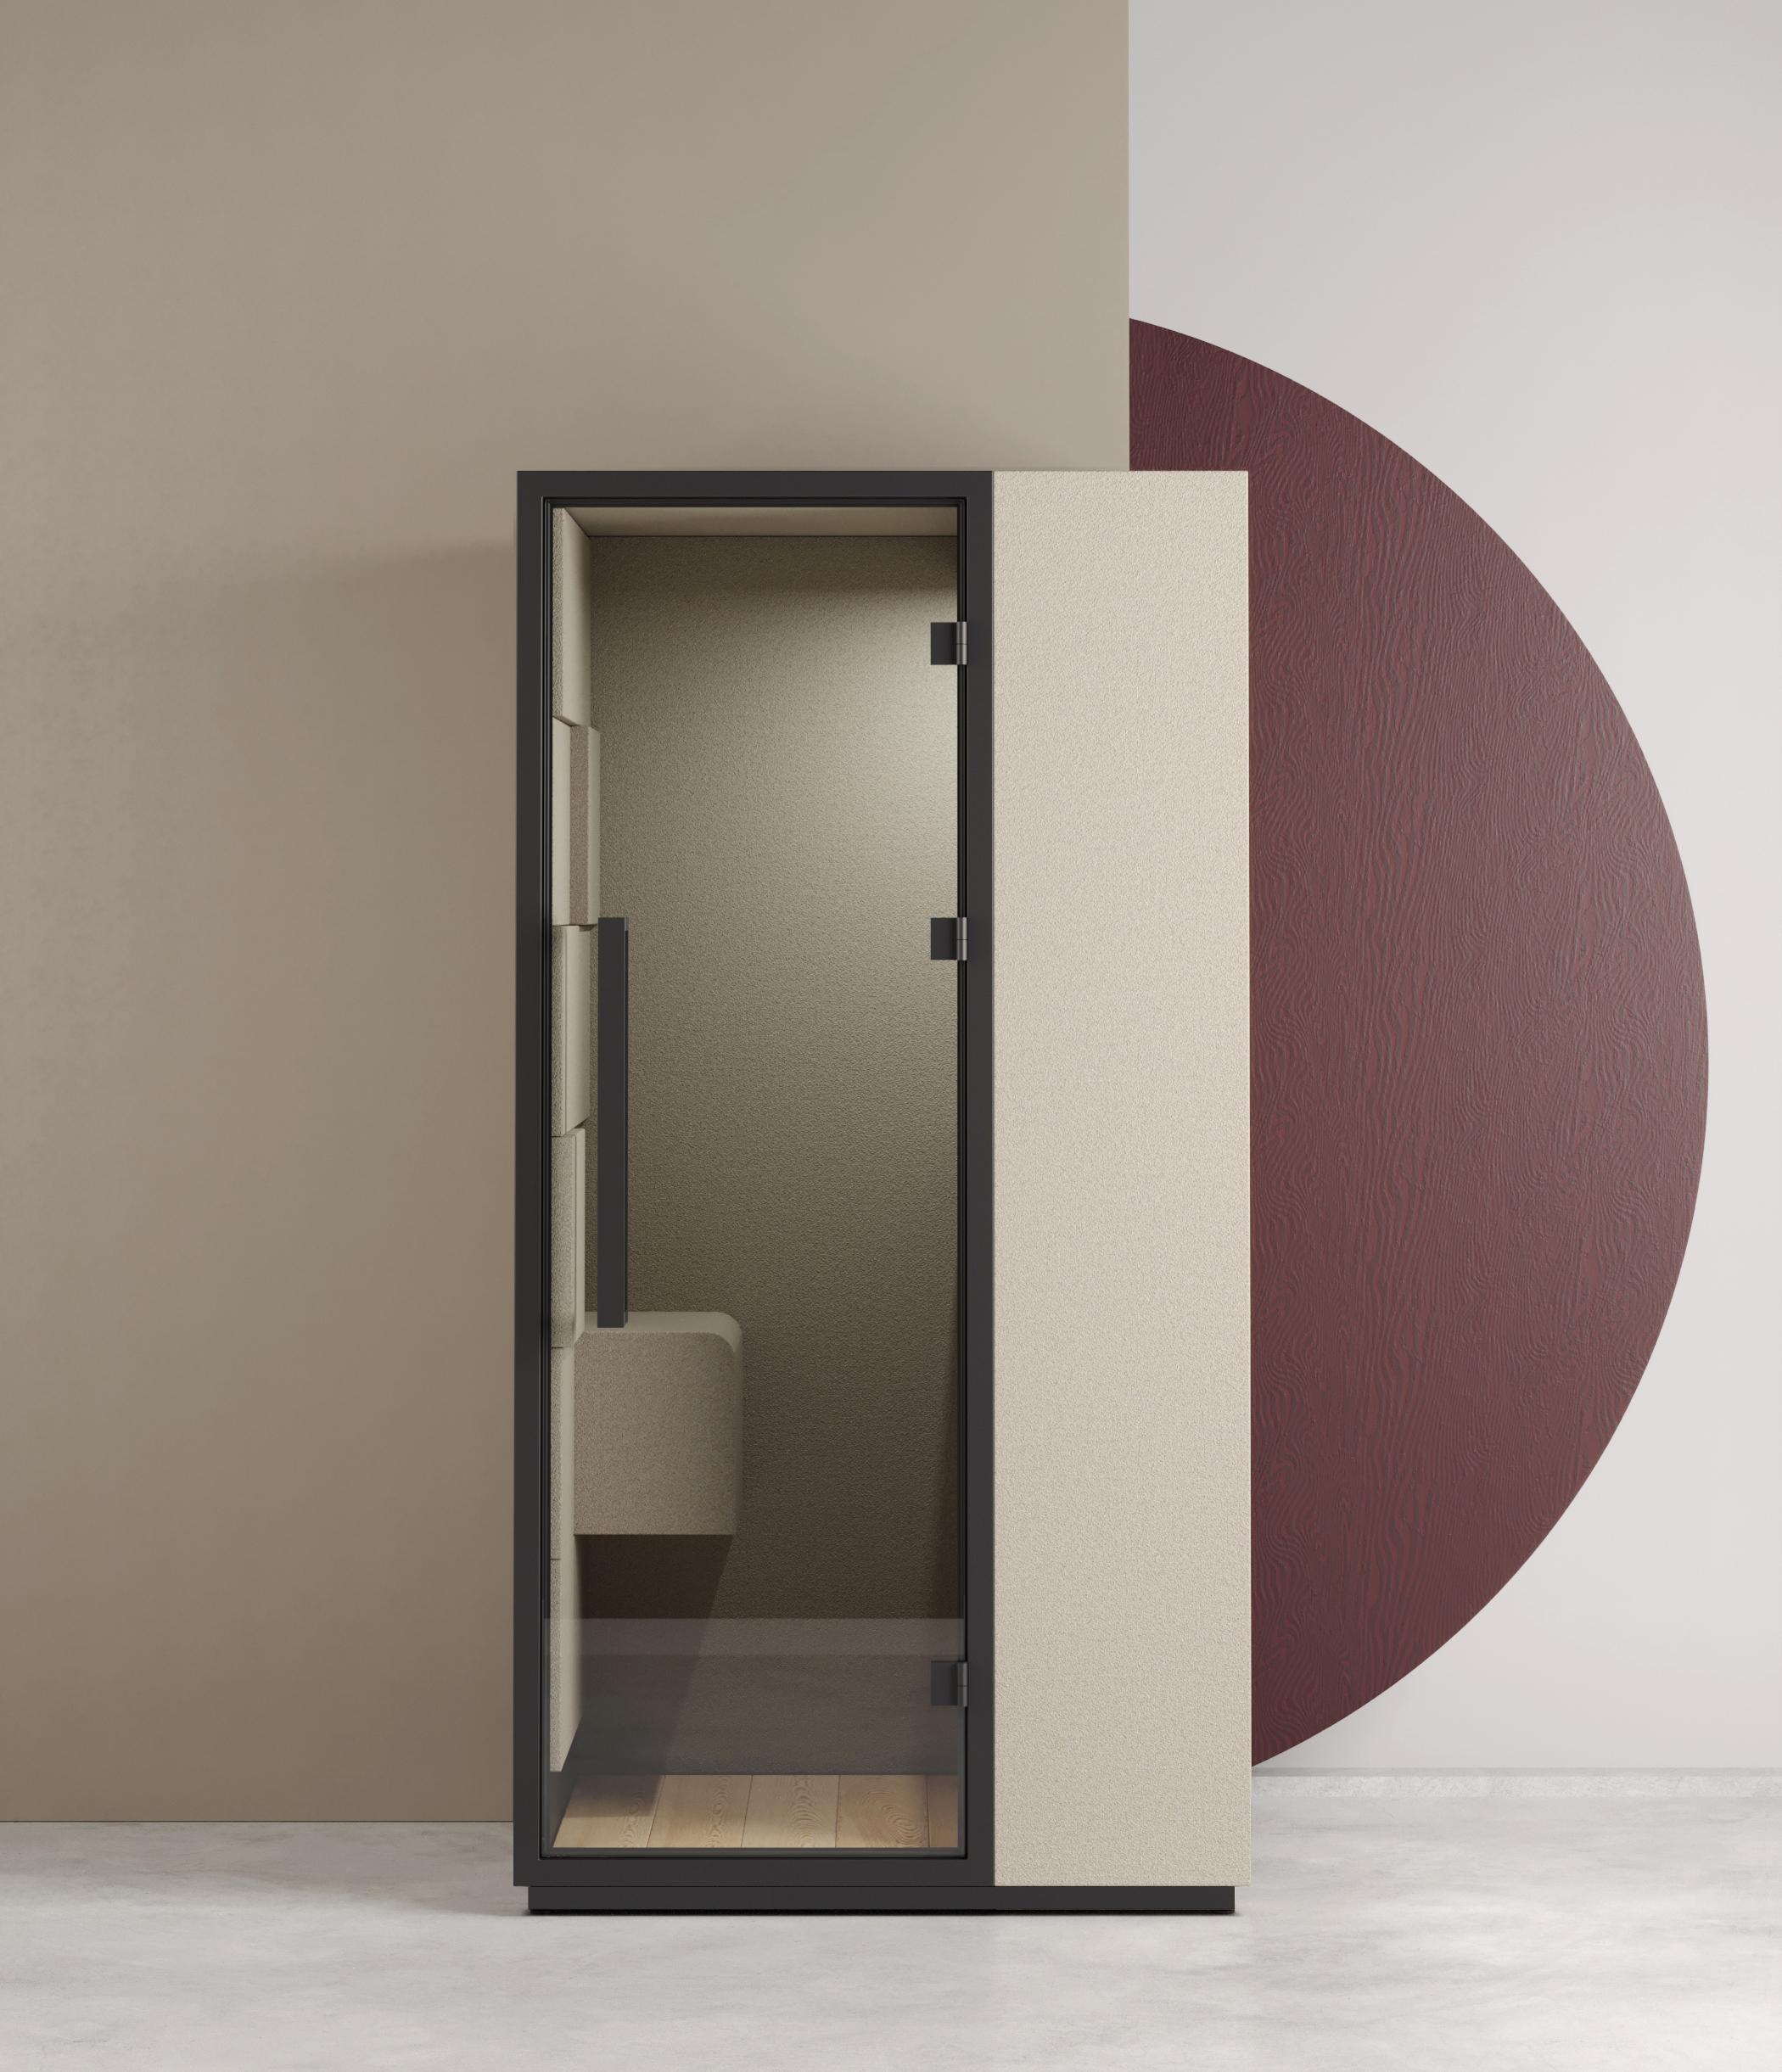 quadra standing box render (1)